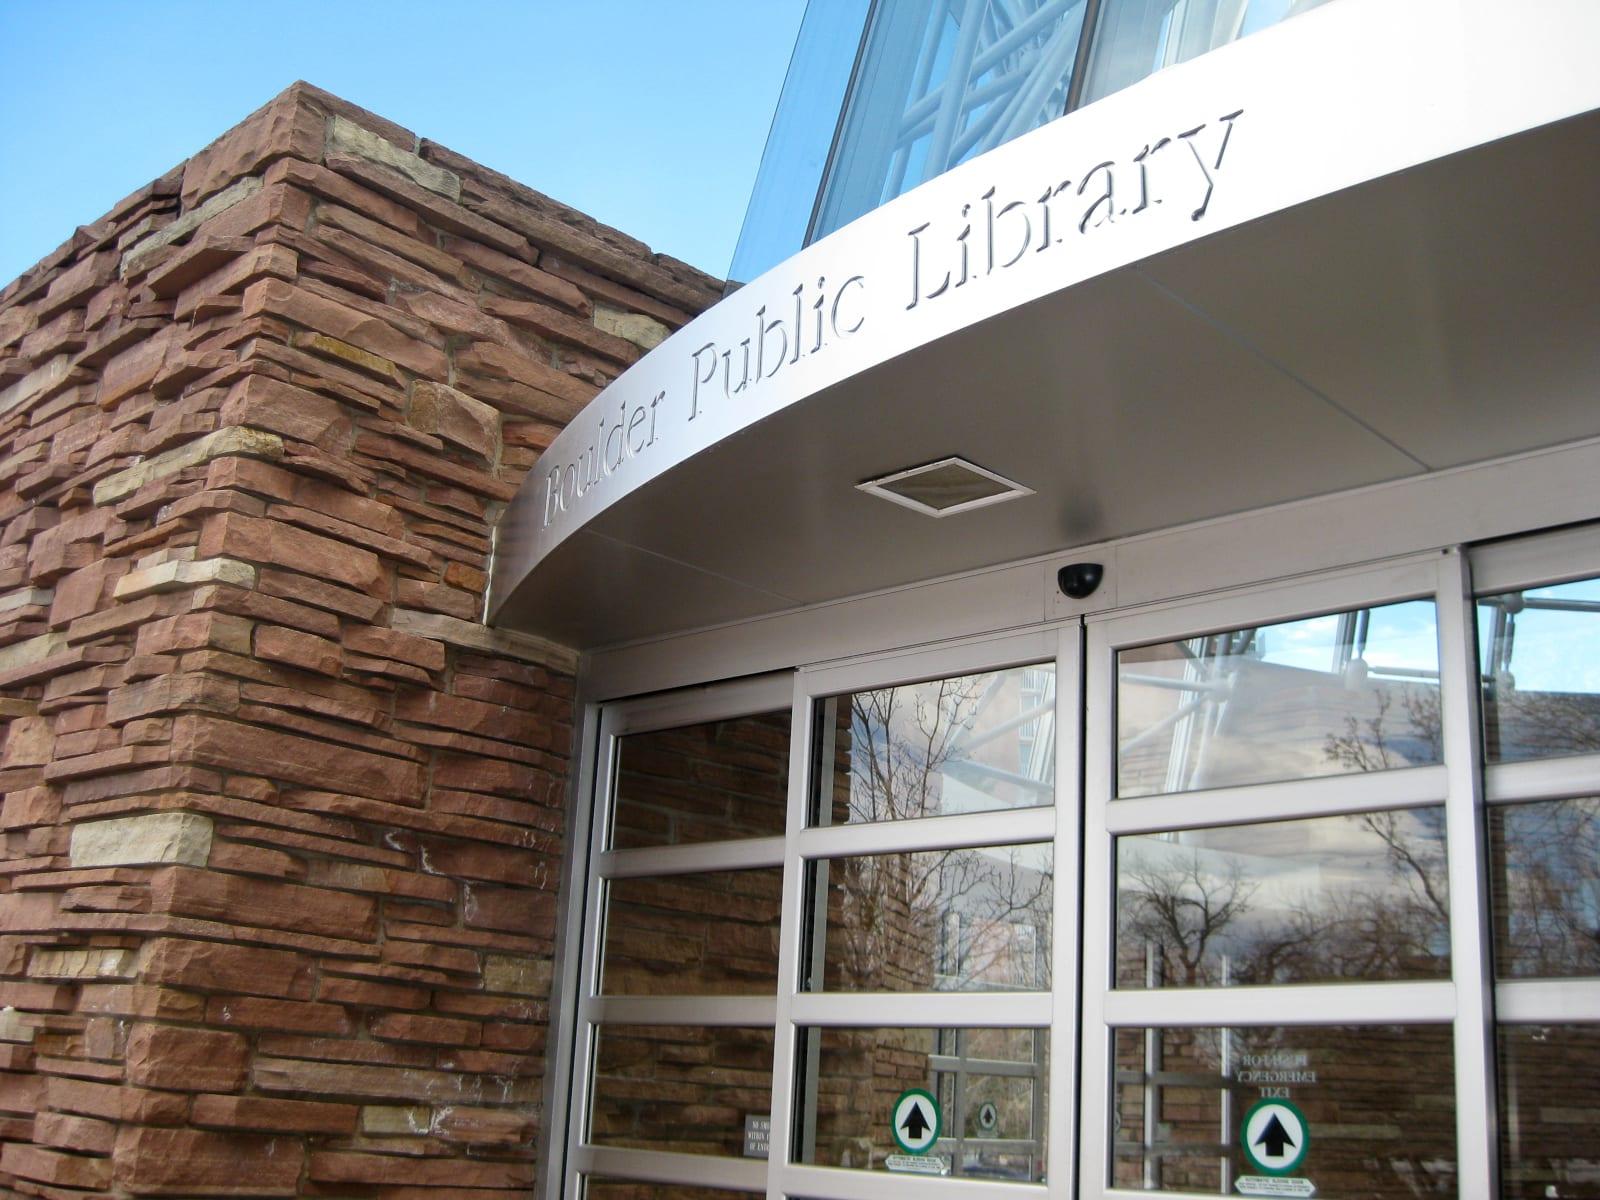 Boulder Public Library Main Branch Entrance